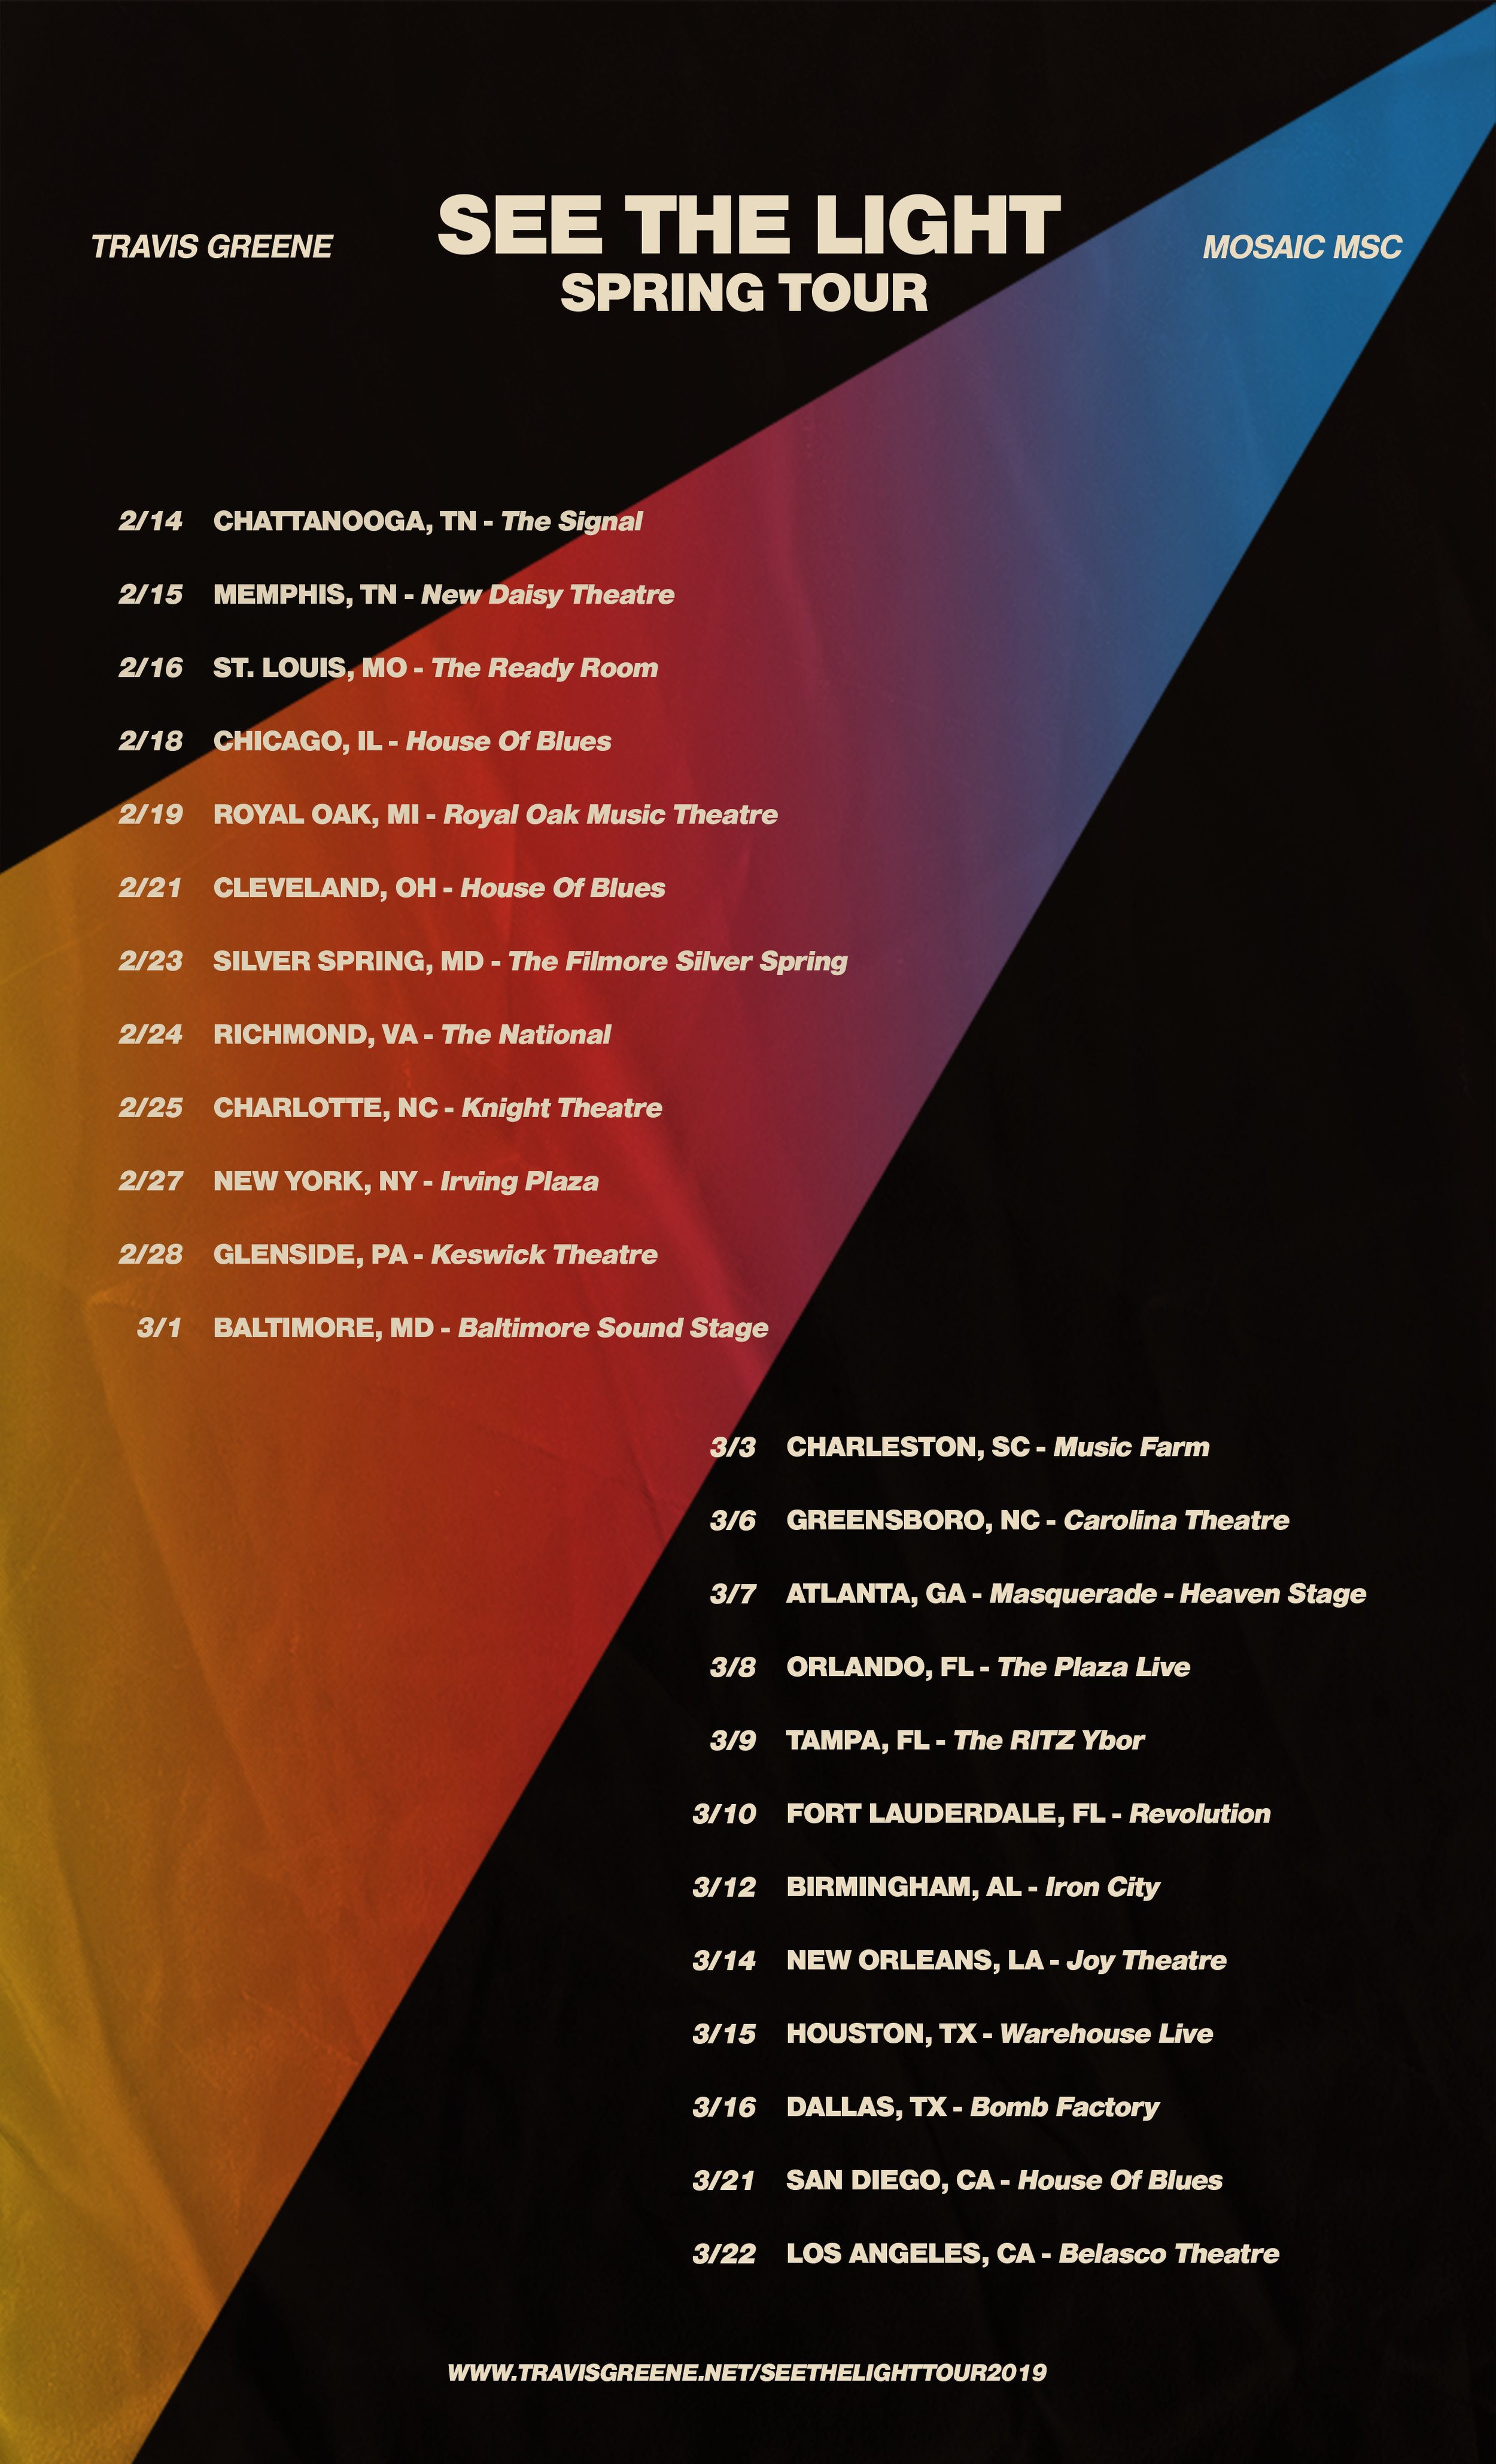 SEE THE LIGHT TOUR - TRAVIS GREENE & MOSAIC MSC